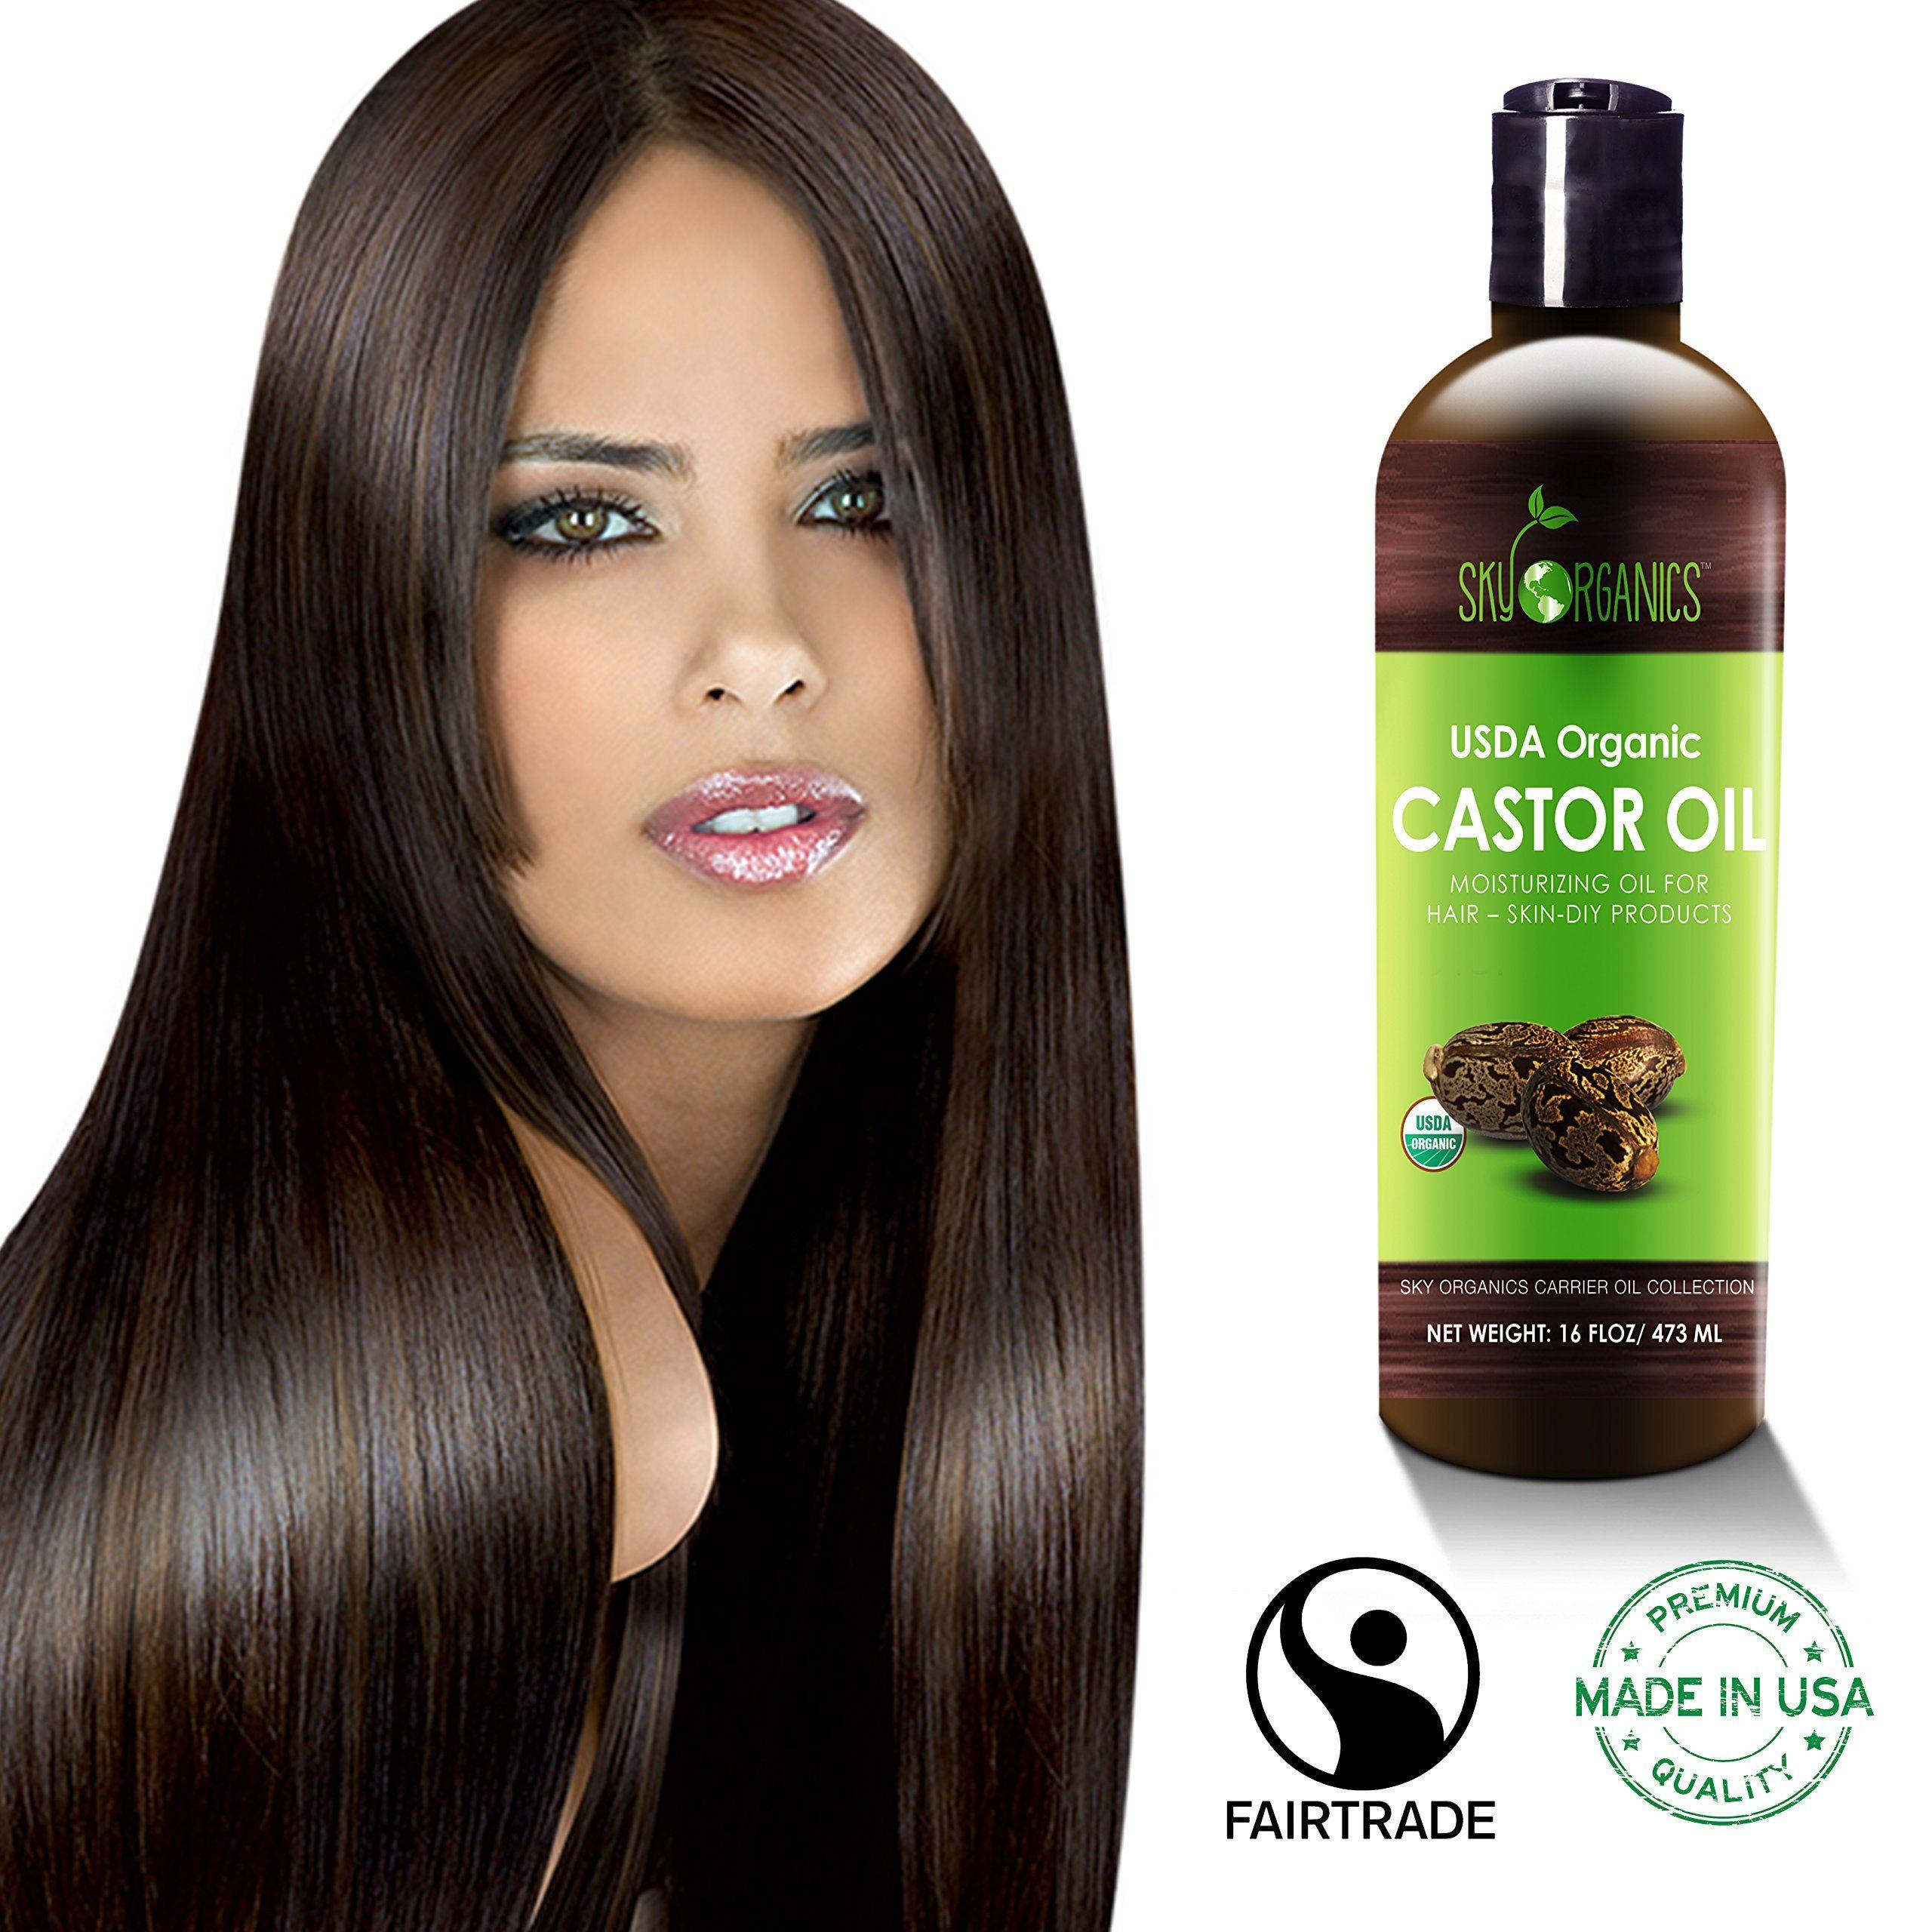 121a2ca68c8 Hair Growth Oils consists of castor oil, Almond Oil, olive oil, vitamin E,  emu oil, almond oil, grapeseed oil, coconut oil, jojoba oil, and amla oil  etc.